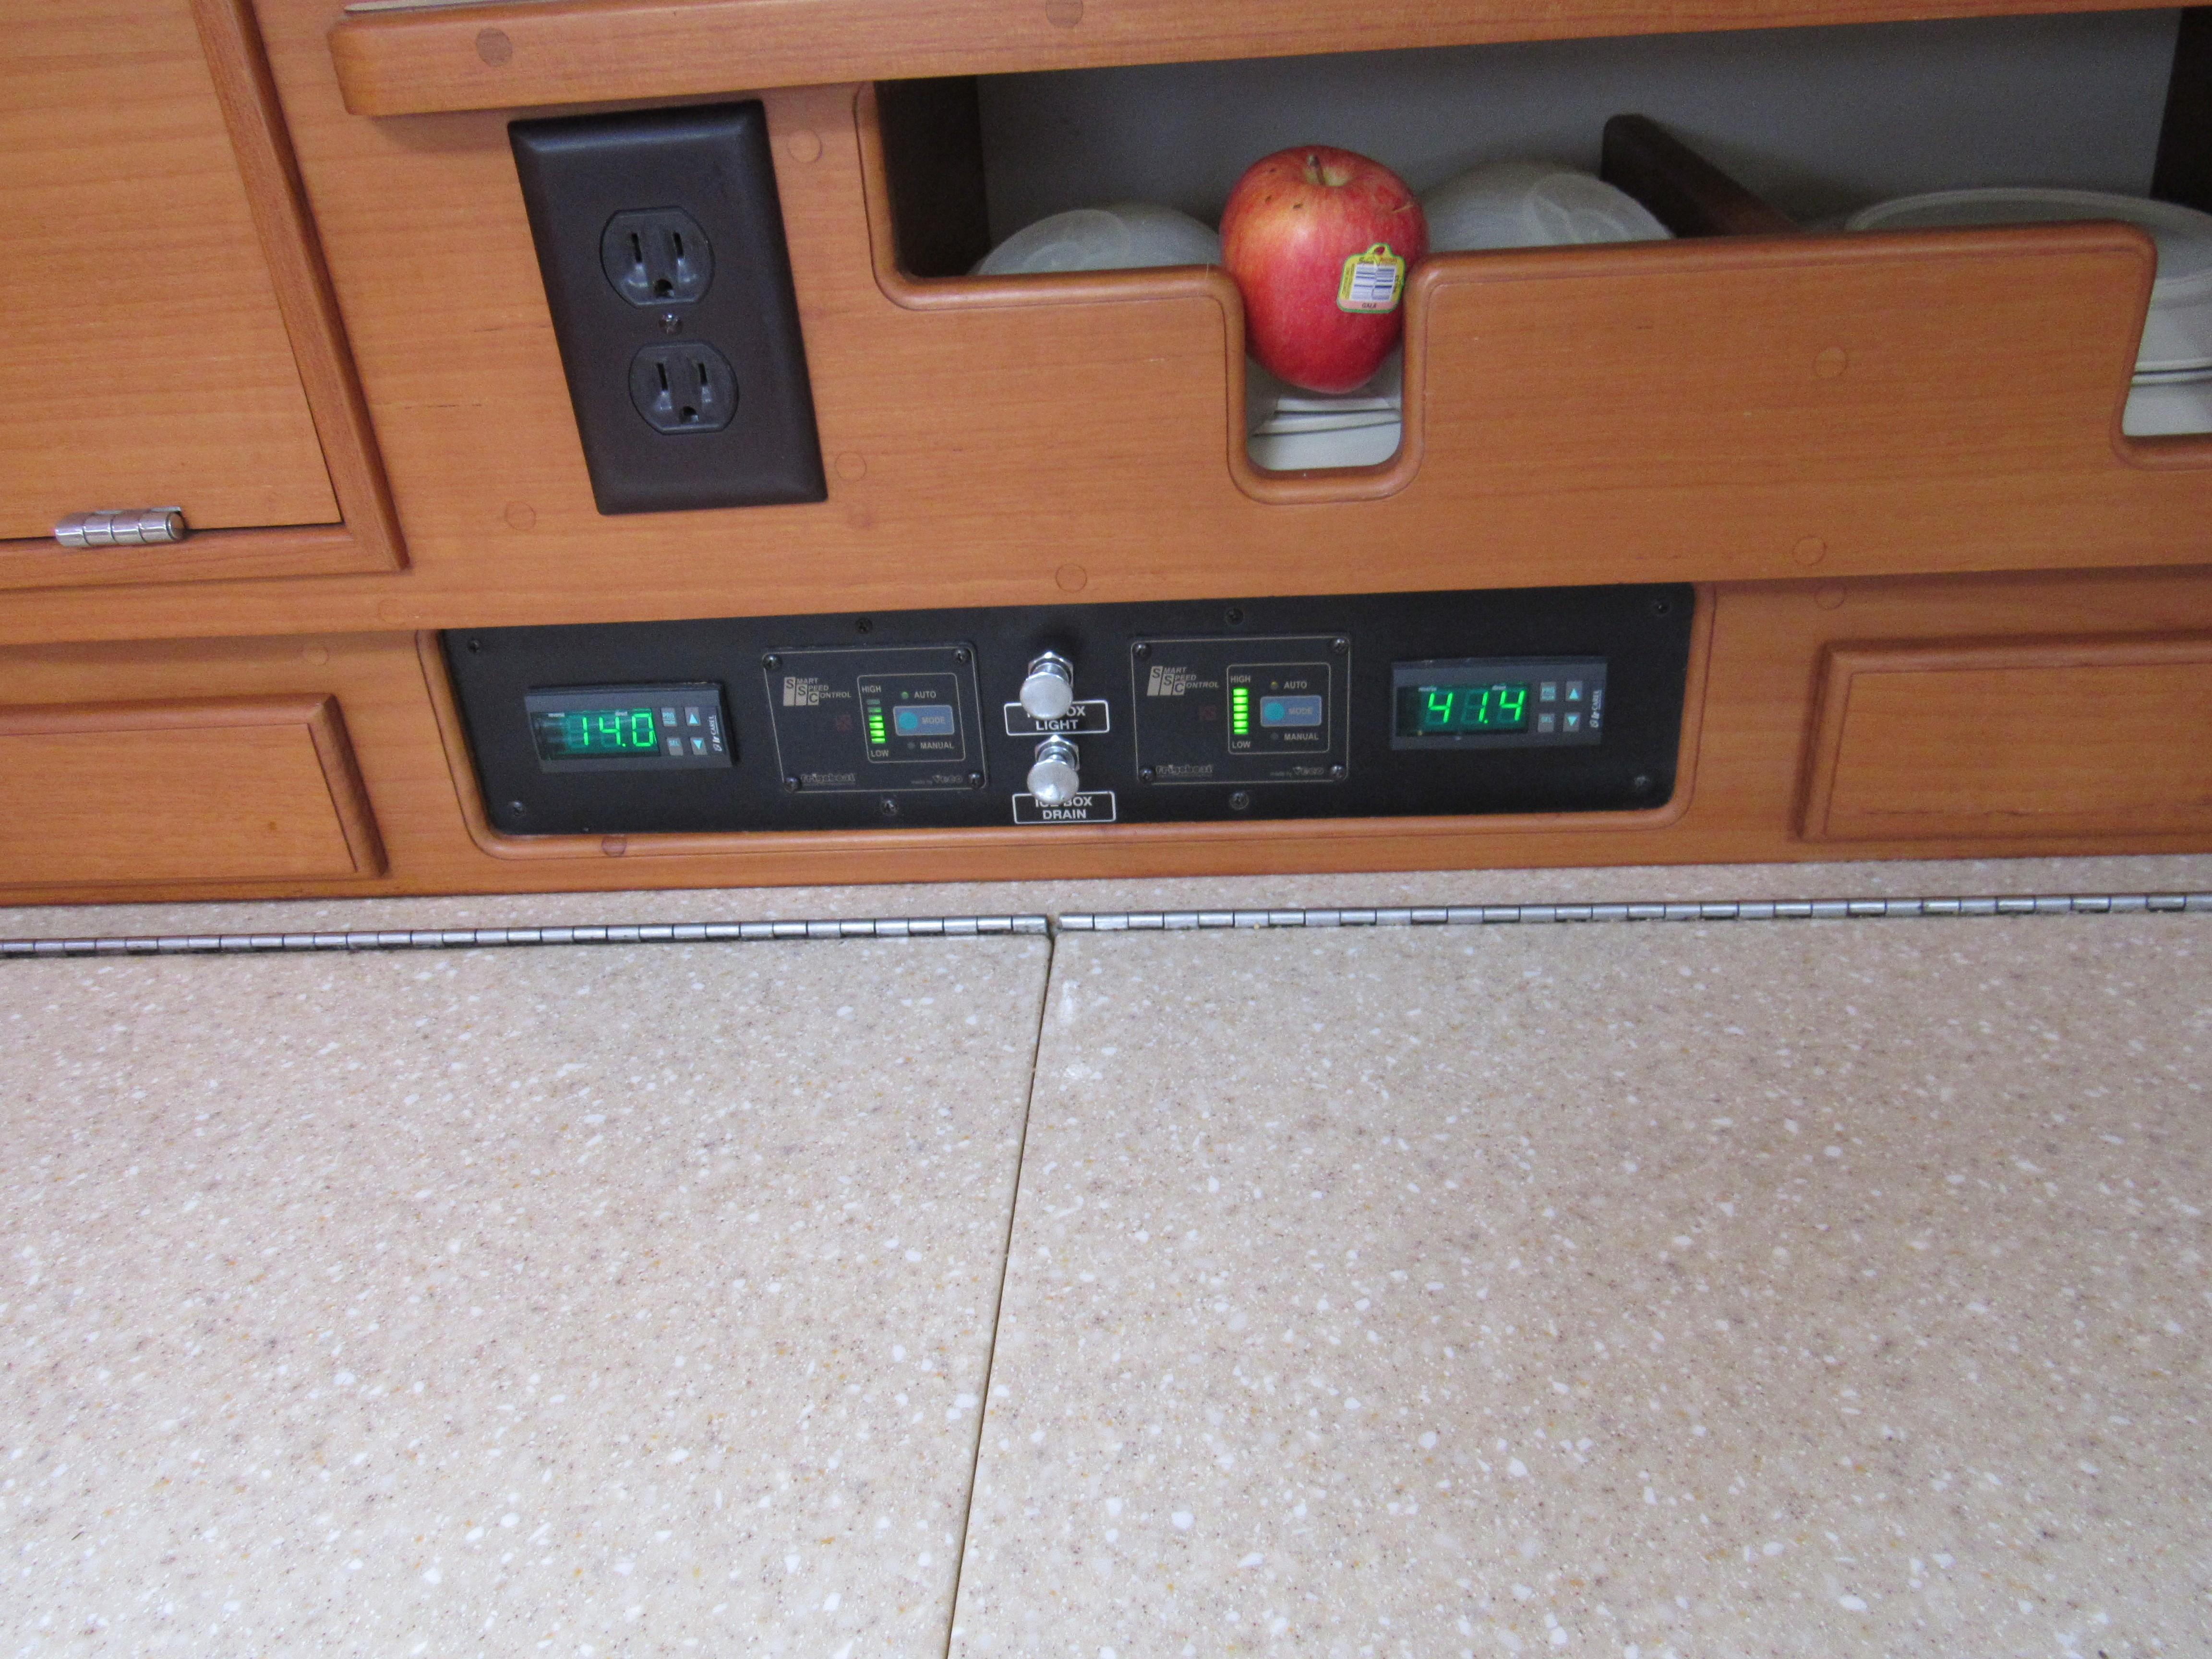 Digital refrigeration controls